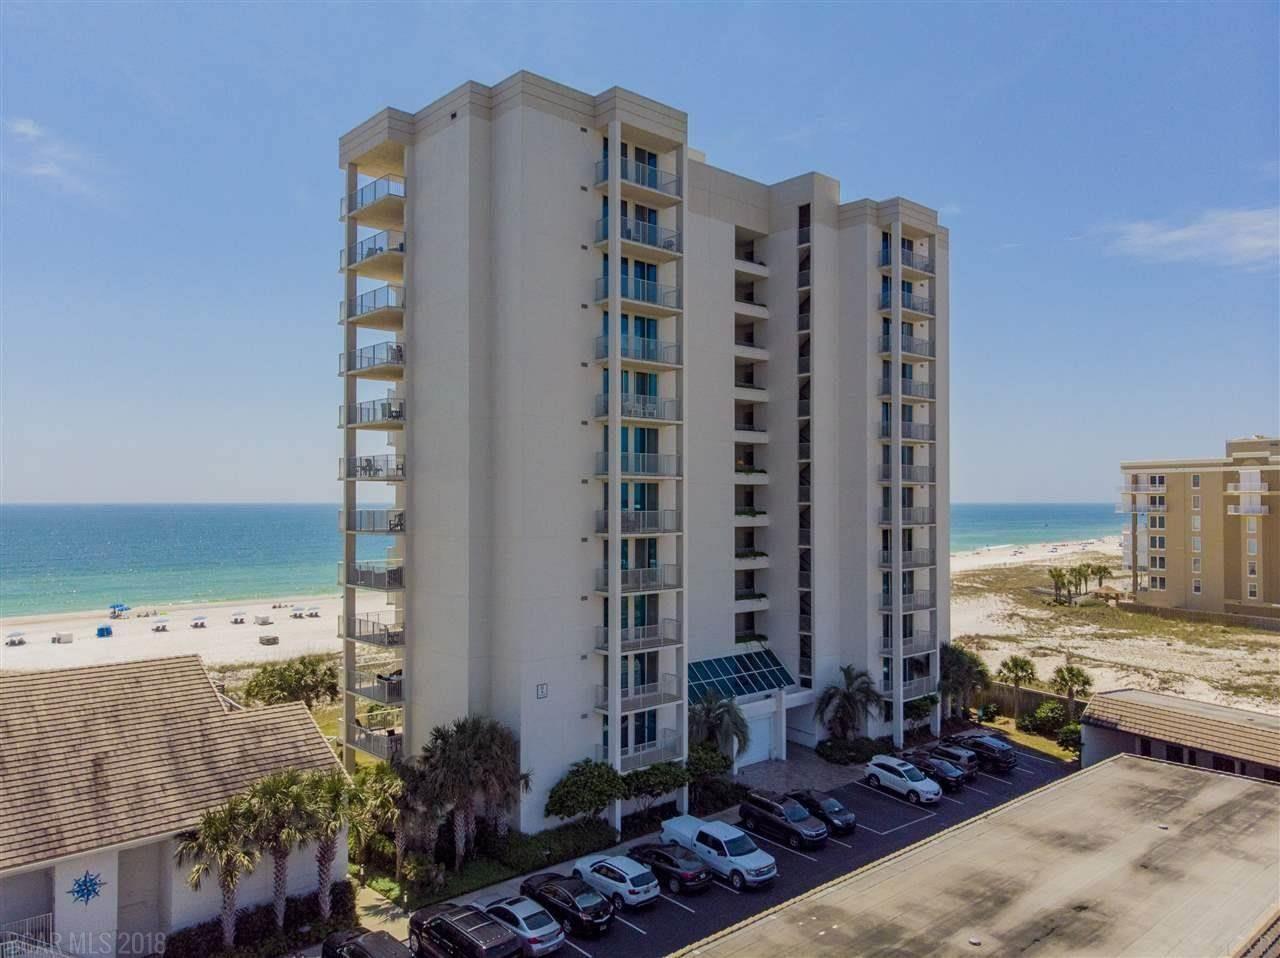 Gulf Shores Orange Beach Perdido Key Condos And Homes For Sale Perdido Key Condo Condo Orange Beach